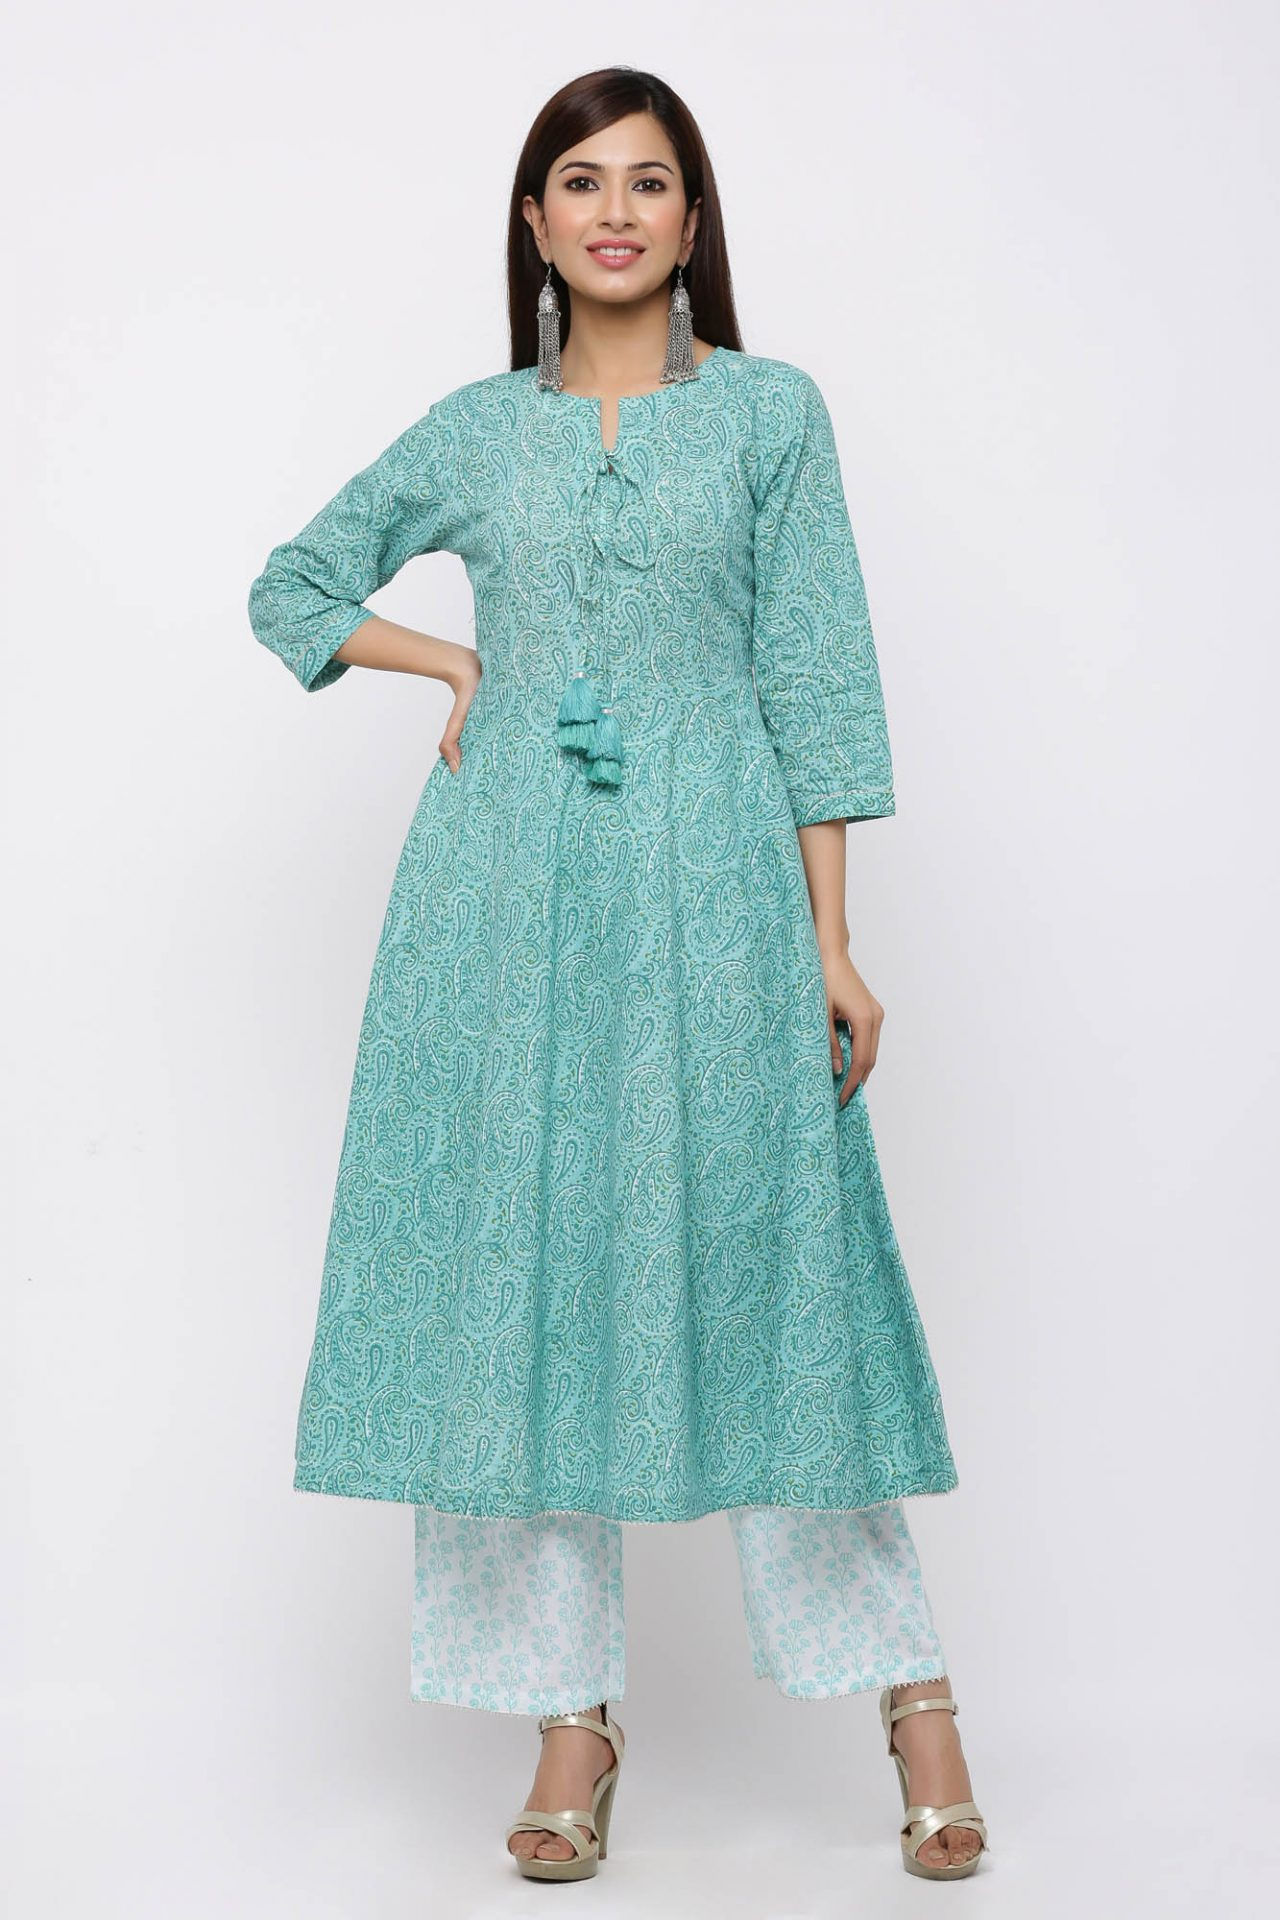 Turquoise printed kurta set with tassel detailing.